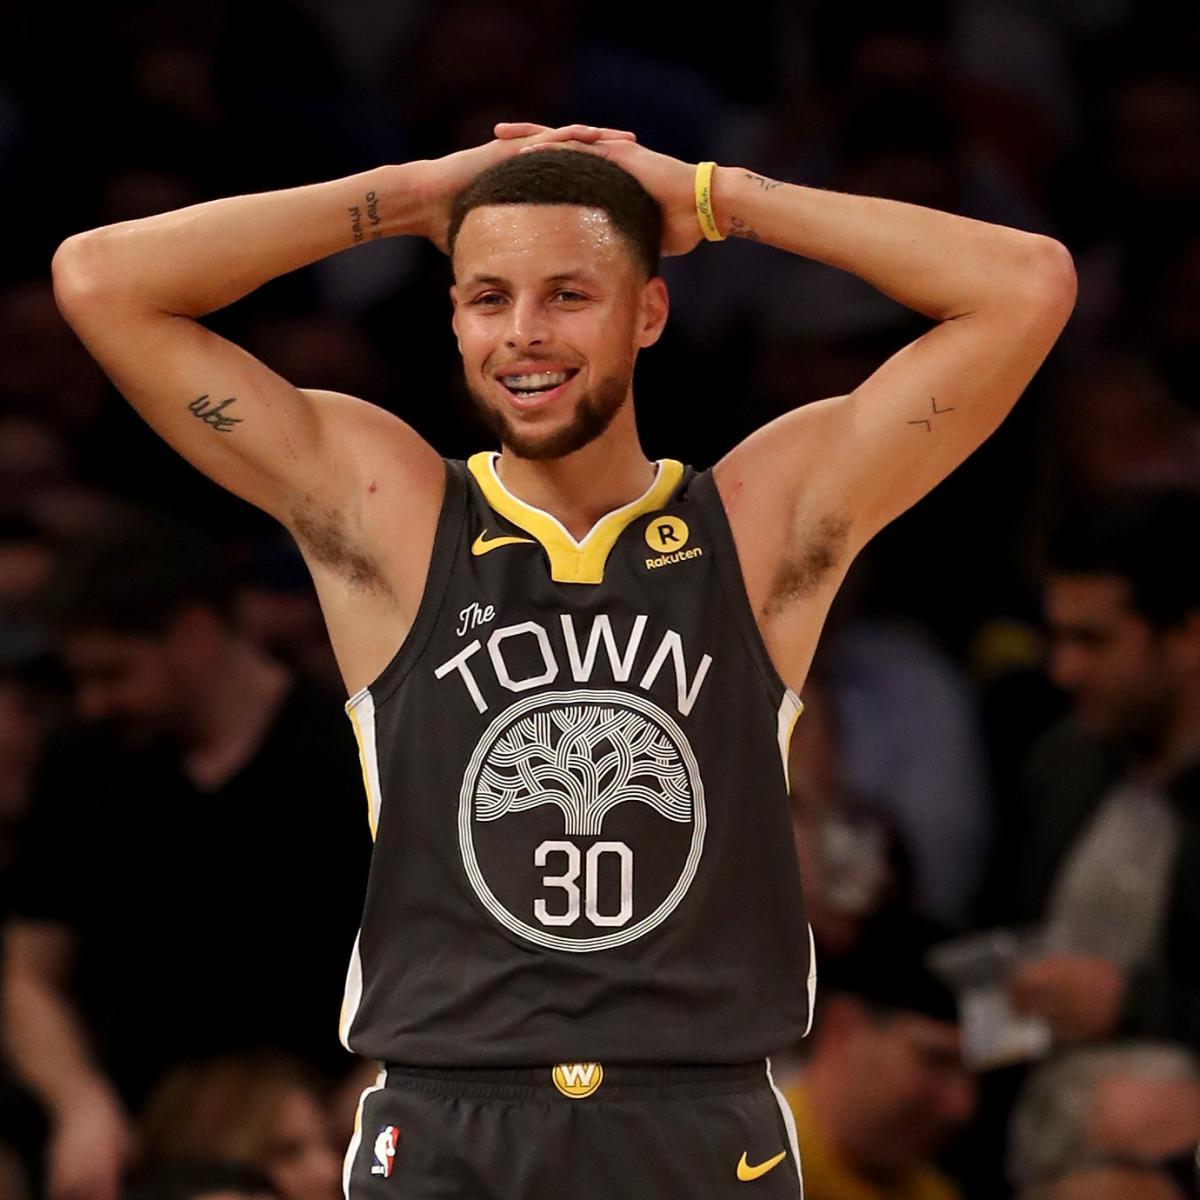 Golden State Warriors Vs Wizards Full Game Highlights: Golden State Warriors Vs. Washington Wizards Odds